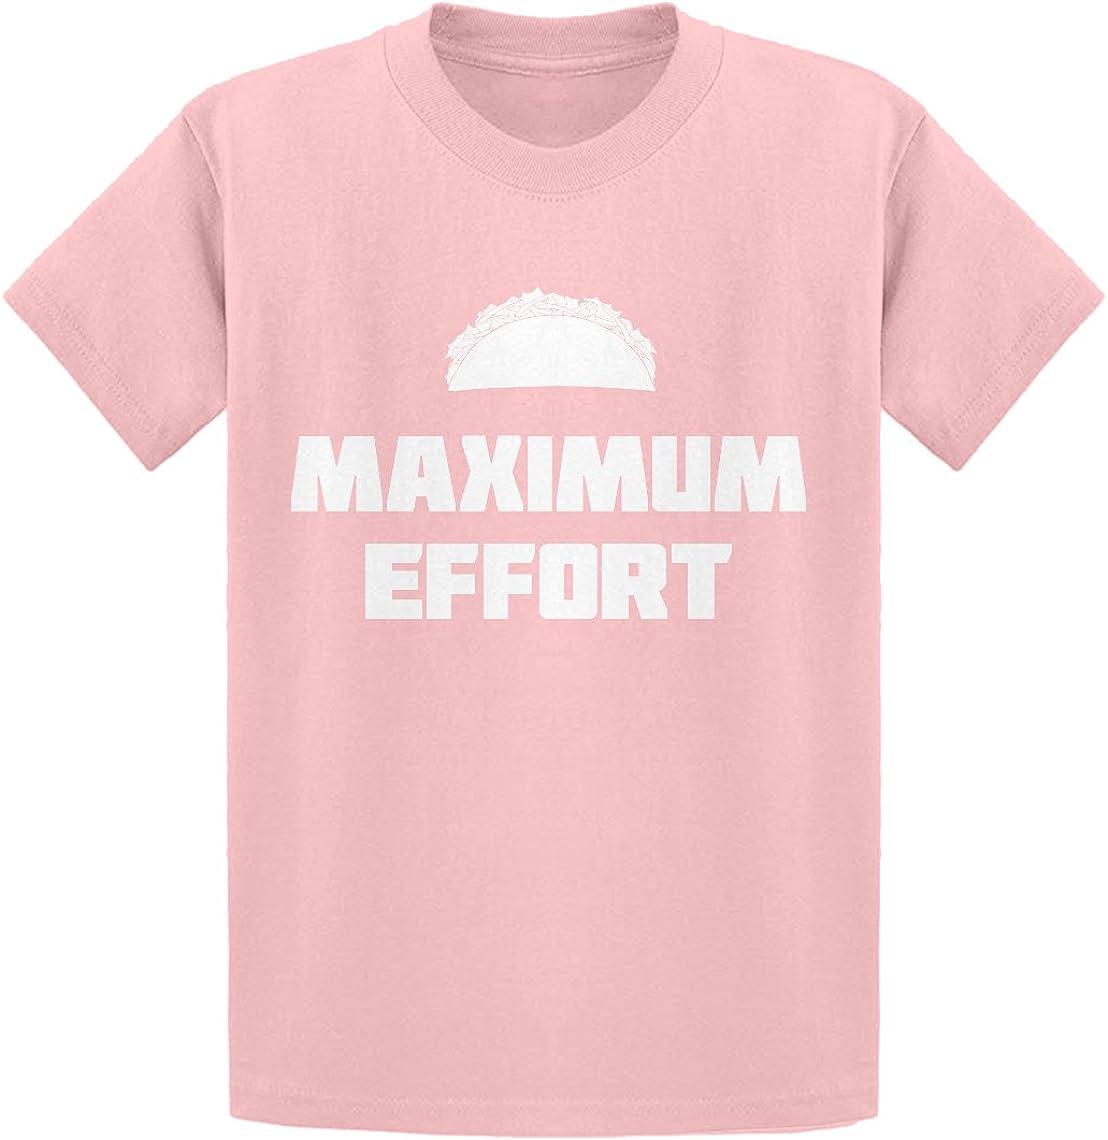 Indica Plateau Maximum Effort Taco Kids T-Shirt